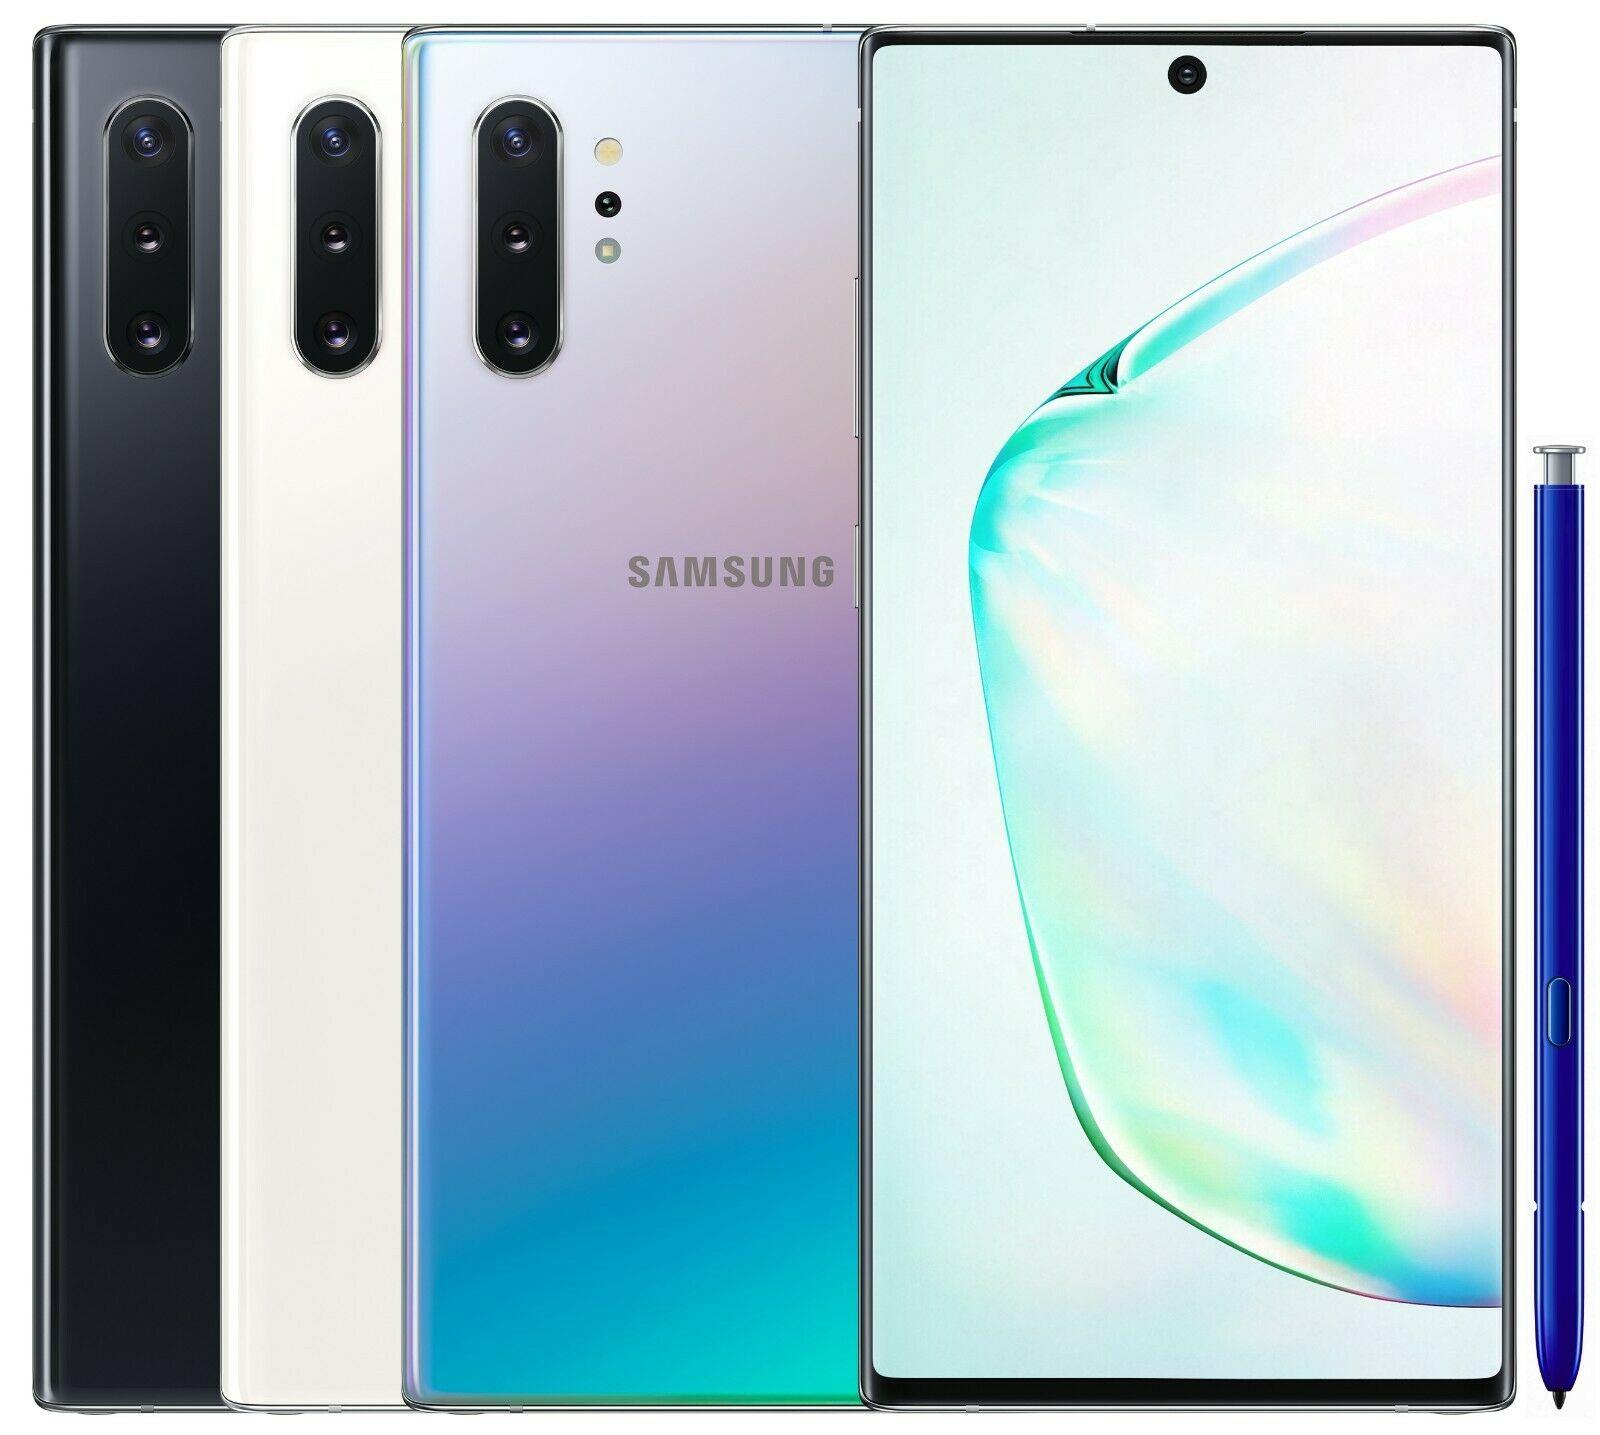 Samsung Galaxy Note 10 + (SM-975) 351591113498060 - 5